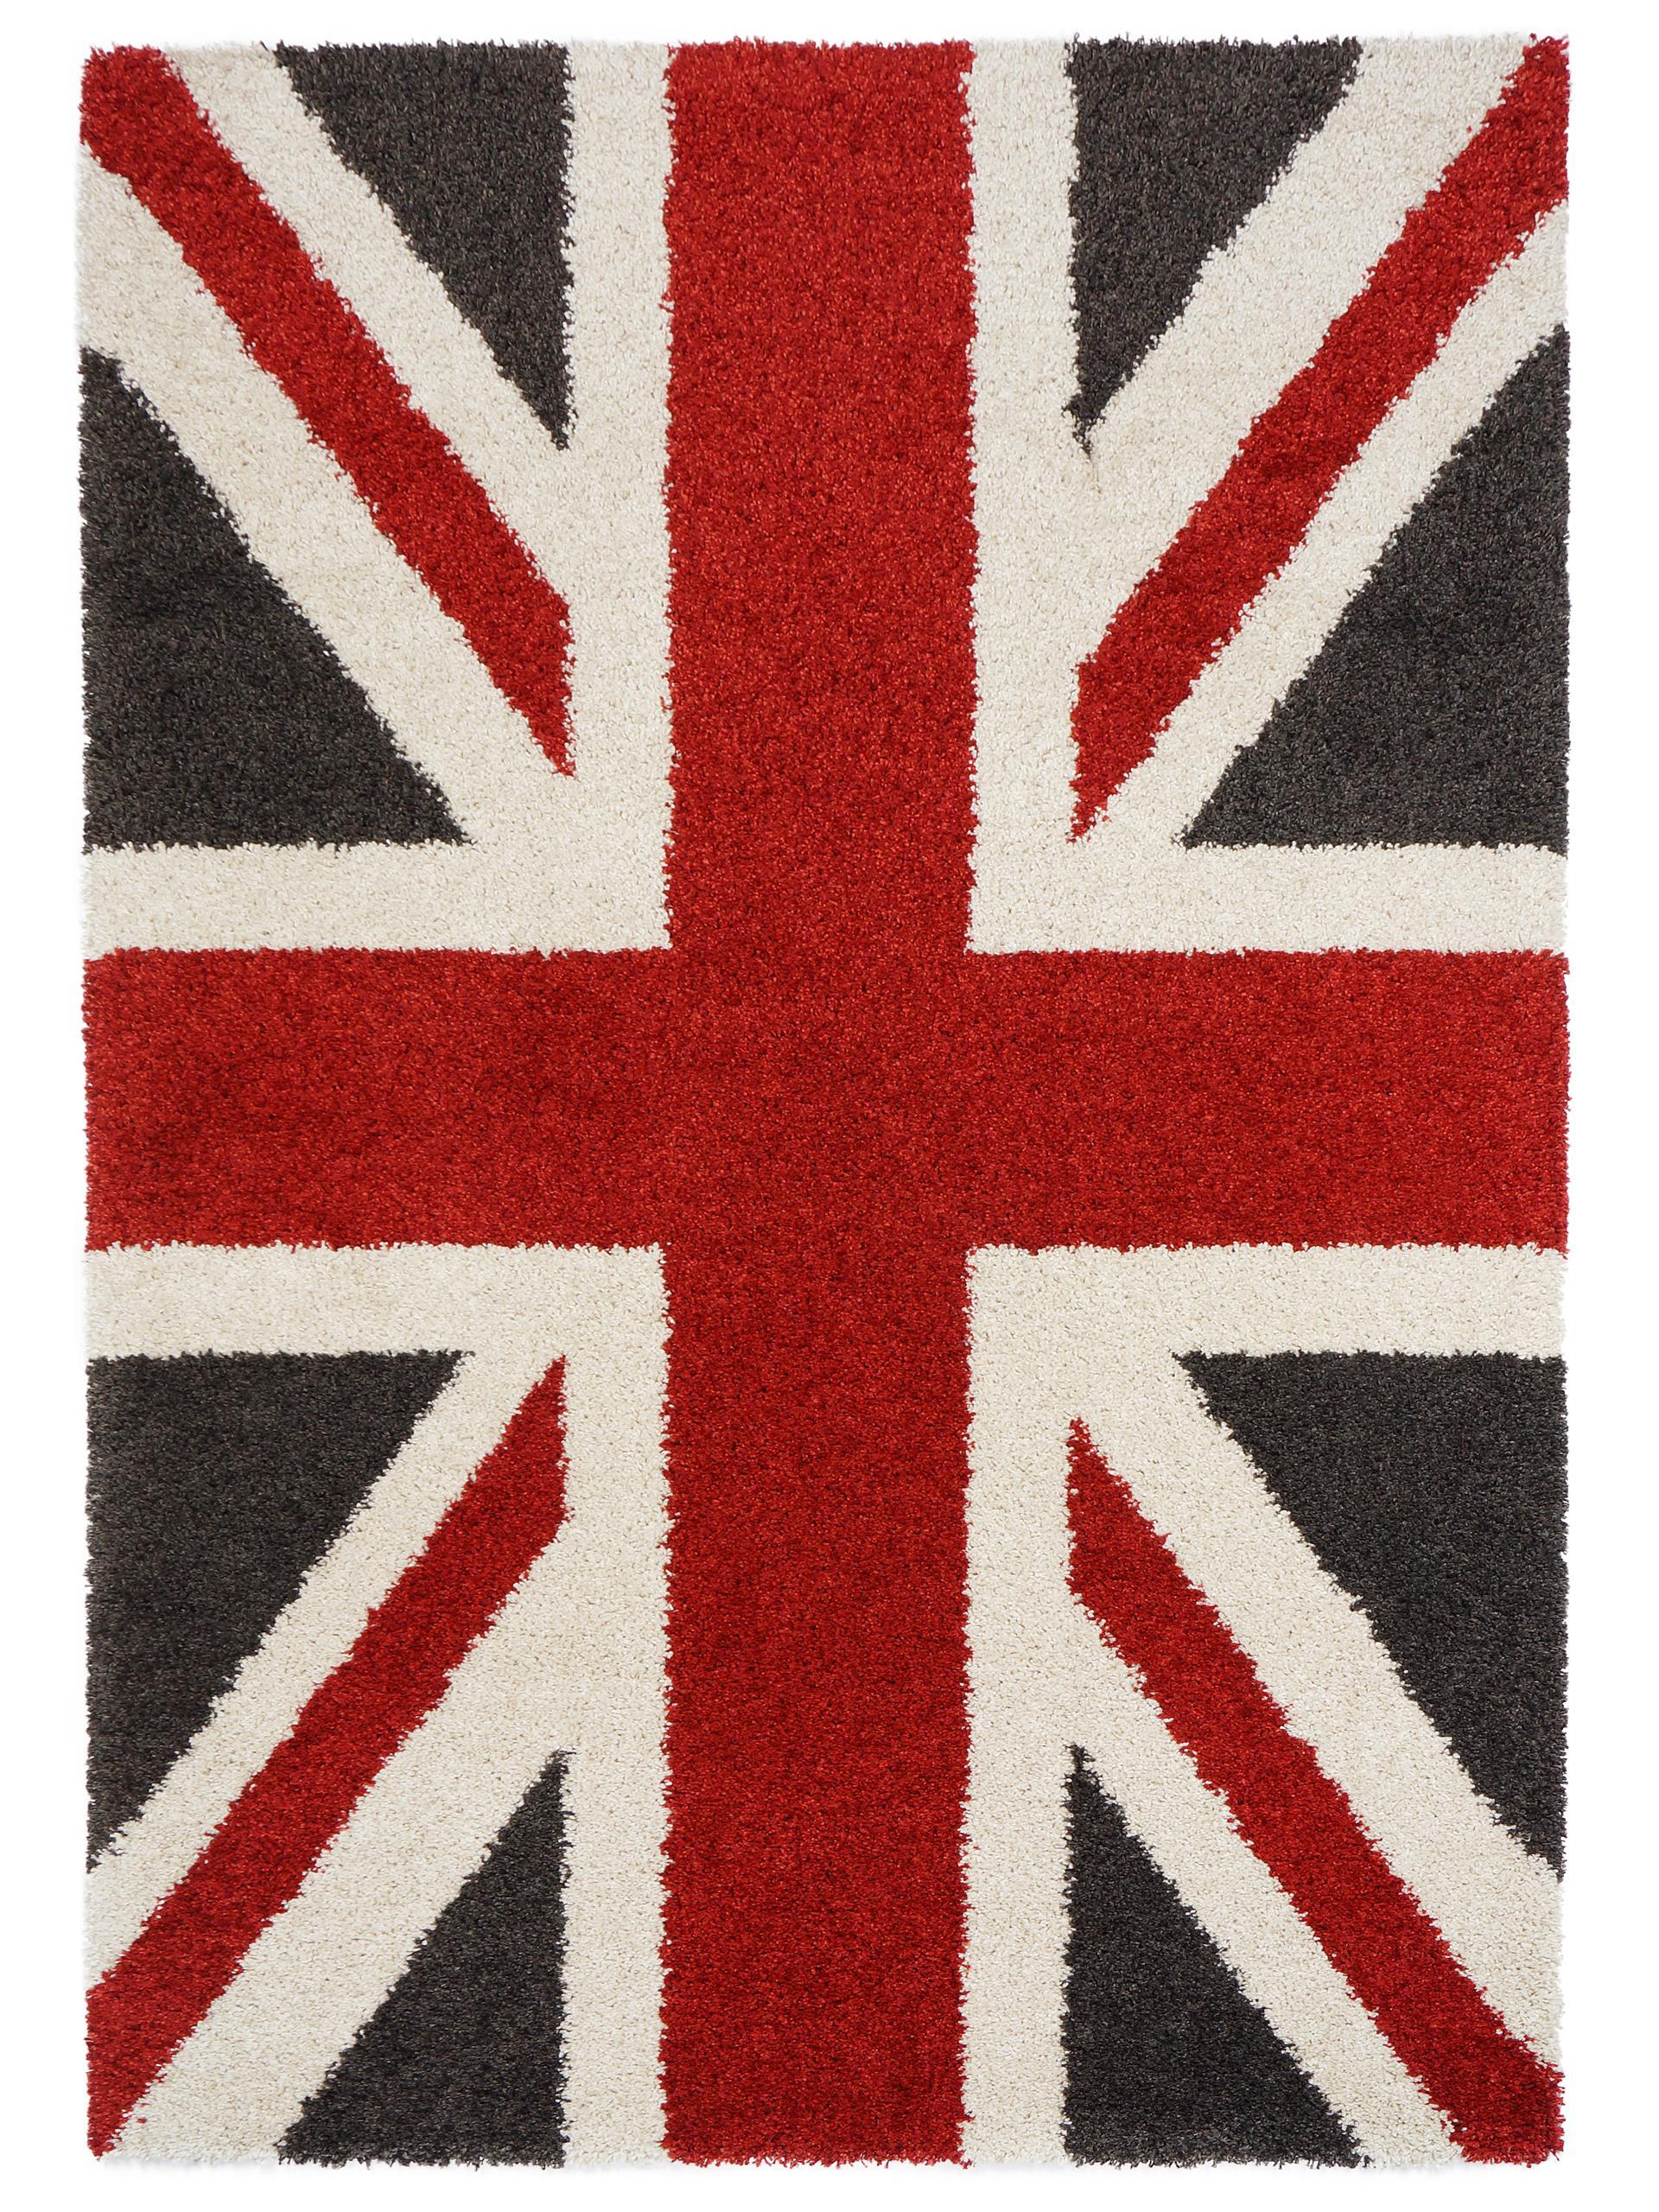 benuta Hochflor Shaggy Teppich Graphic Union Jack